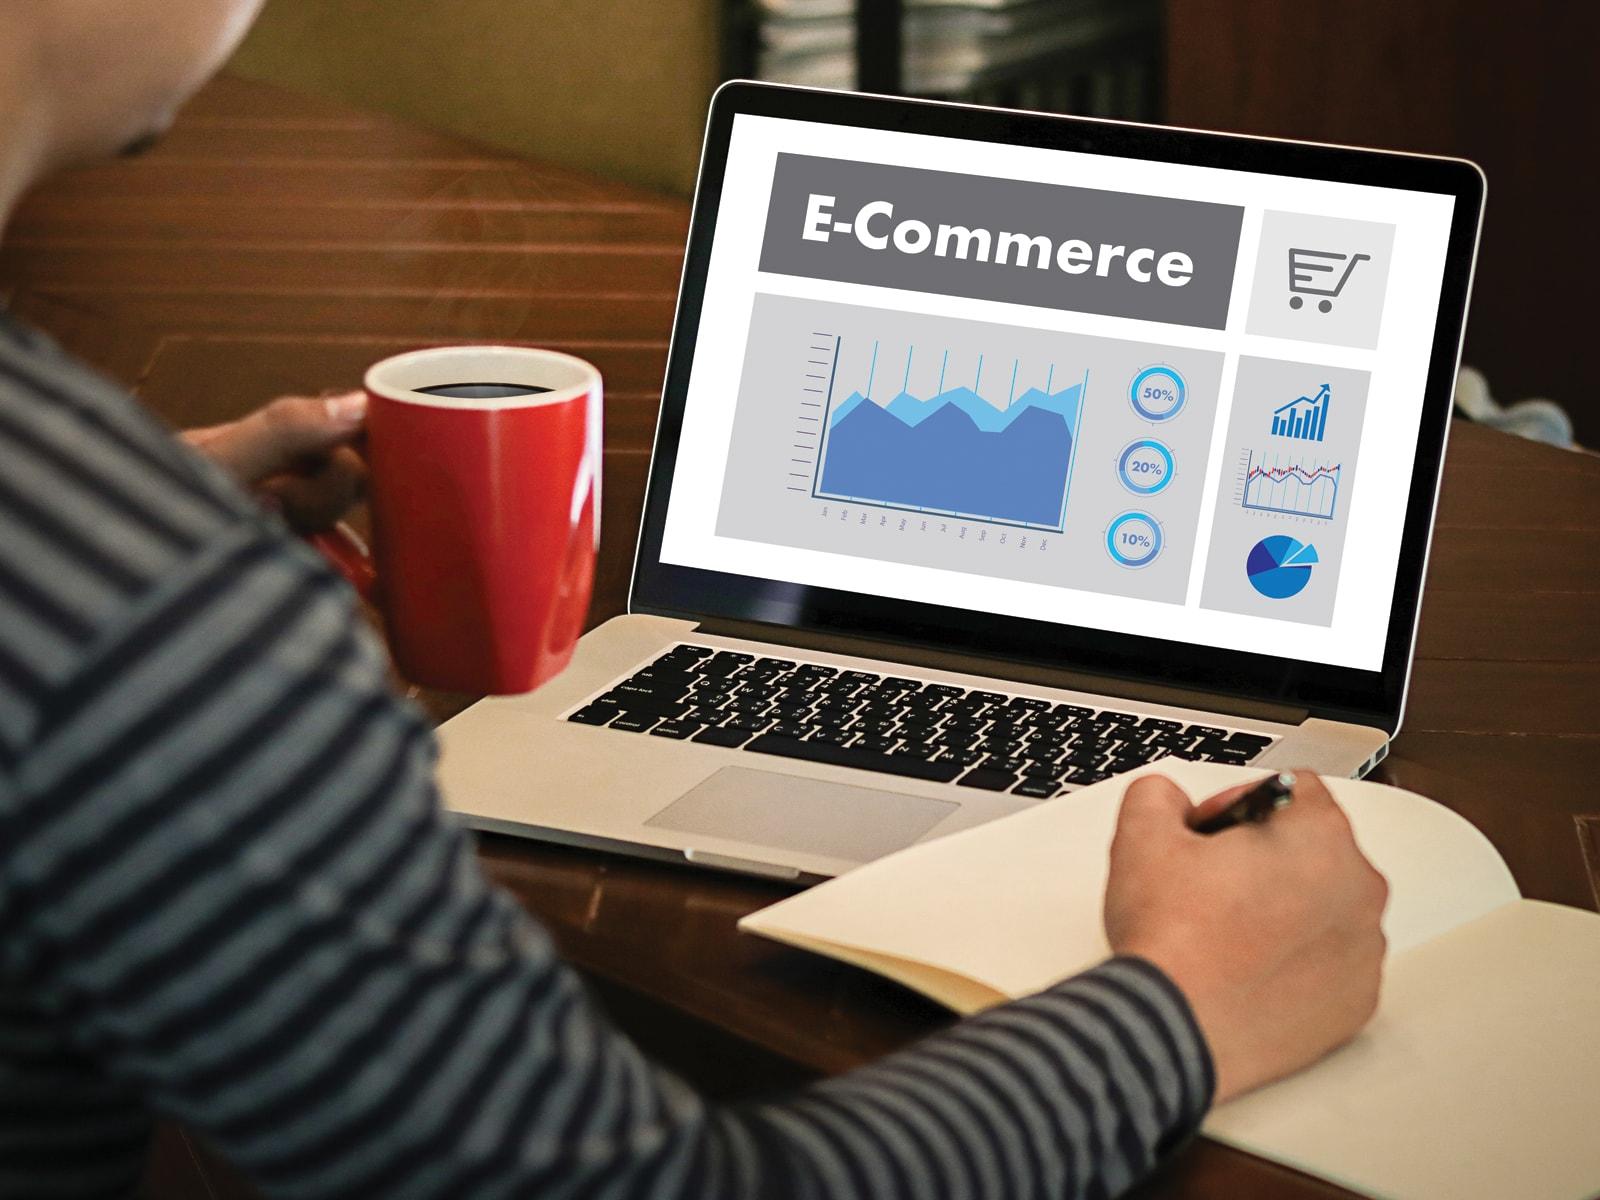 zoekmachine marketing e-commerce